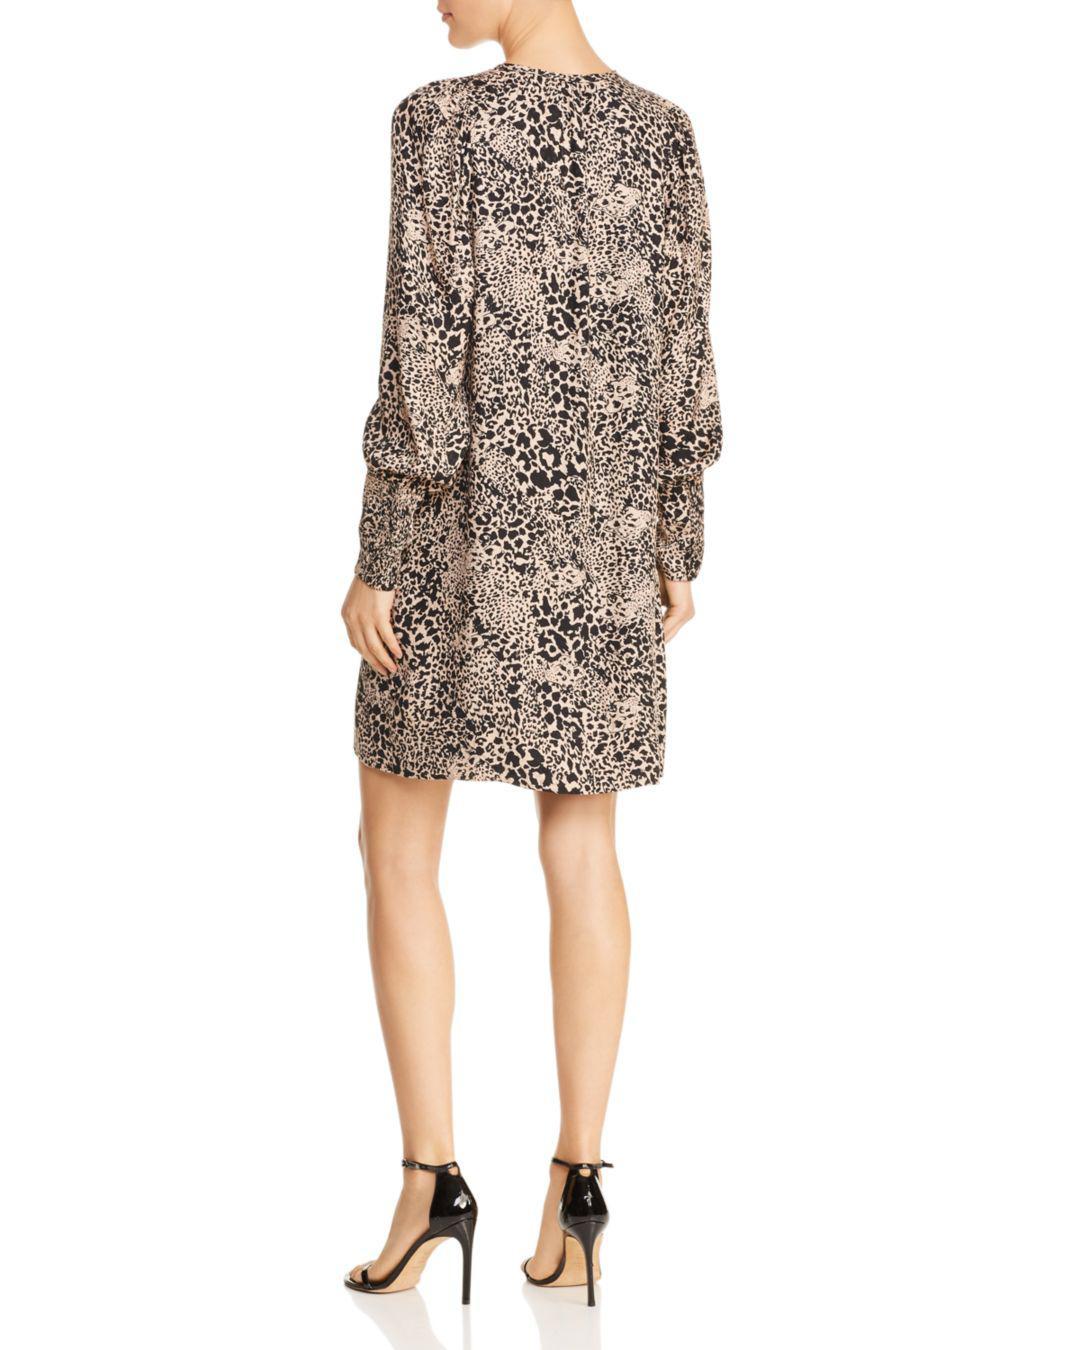 77c9c68d461 Lyst - Rebecca Taylor Hidden Leopard Jacquard Dress Champagne